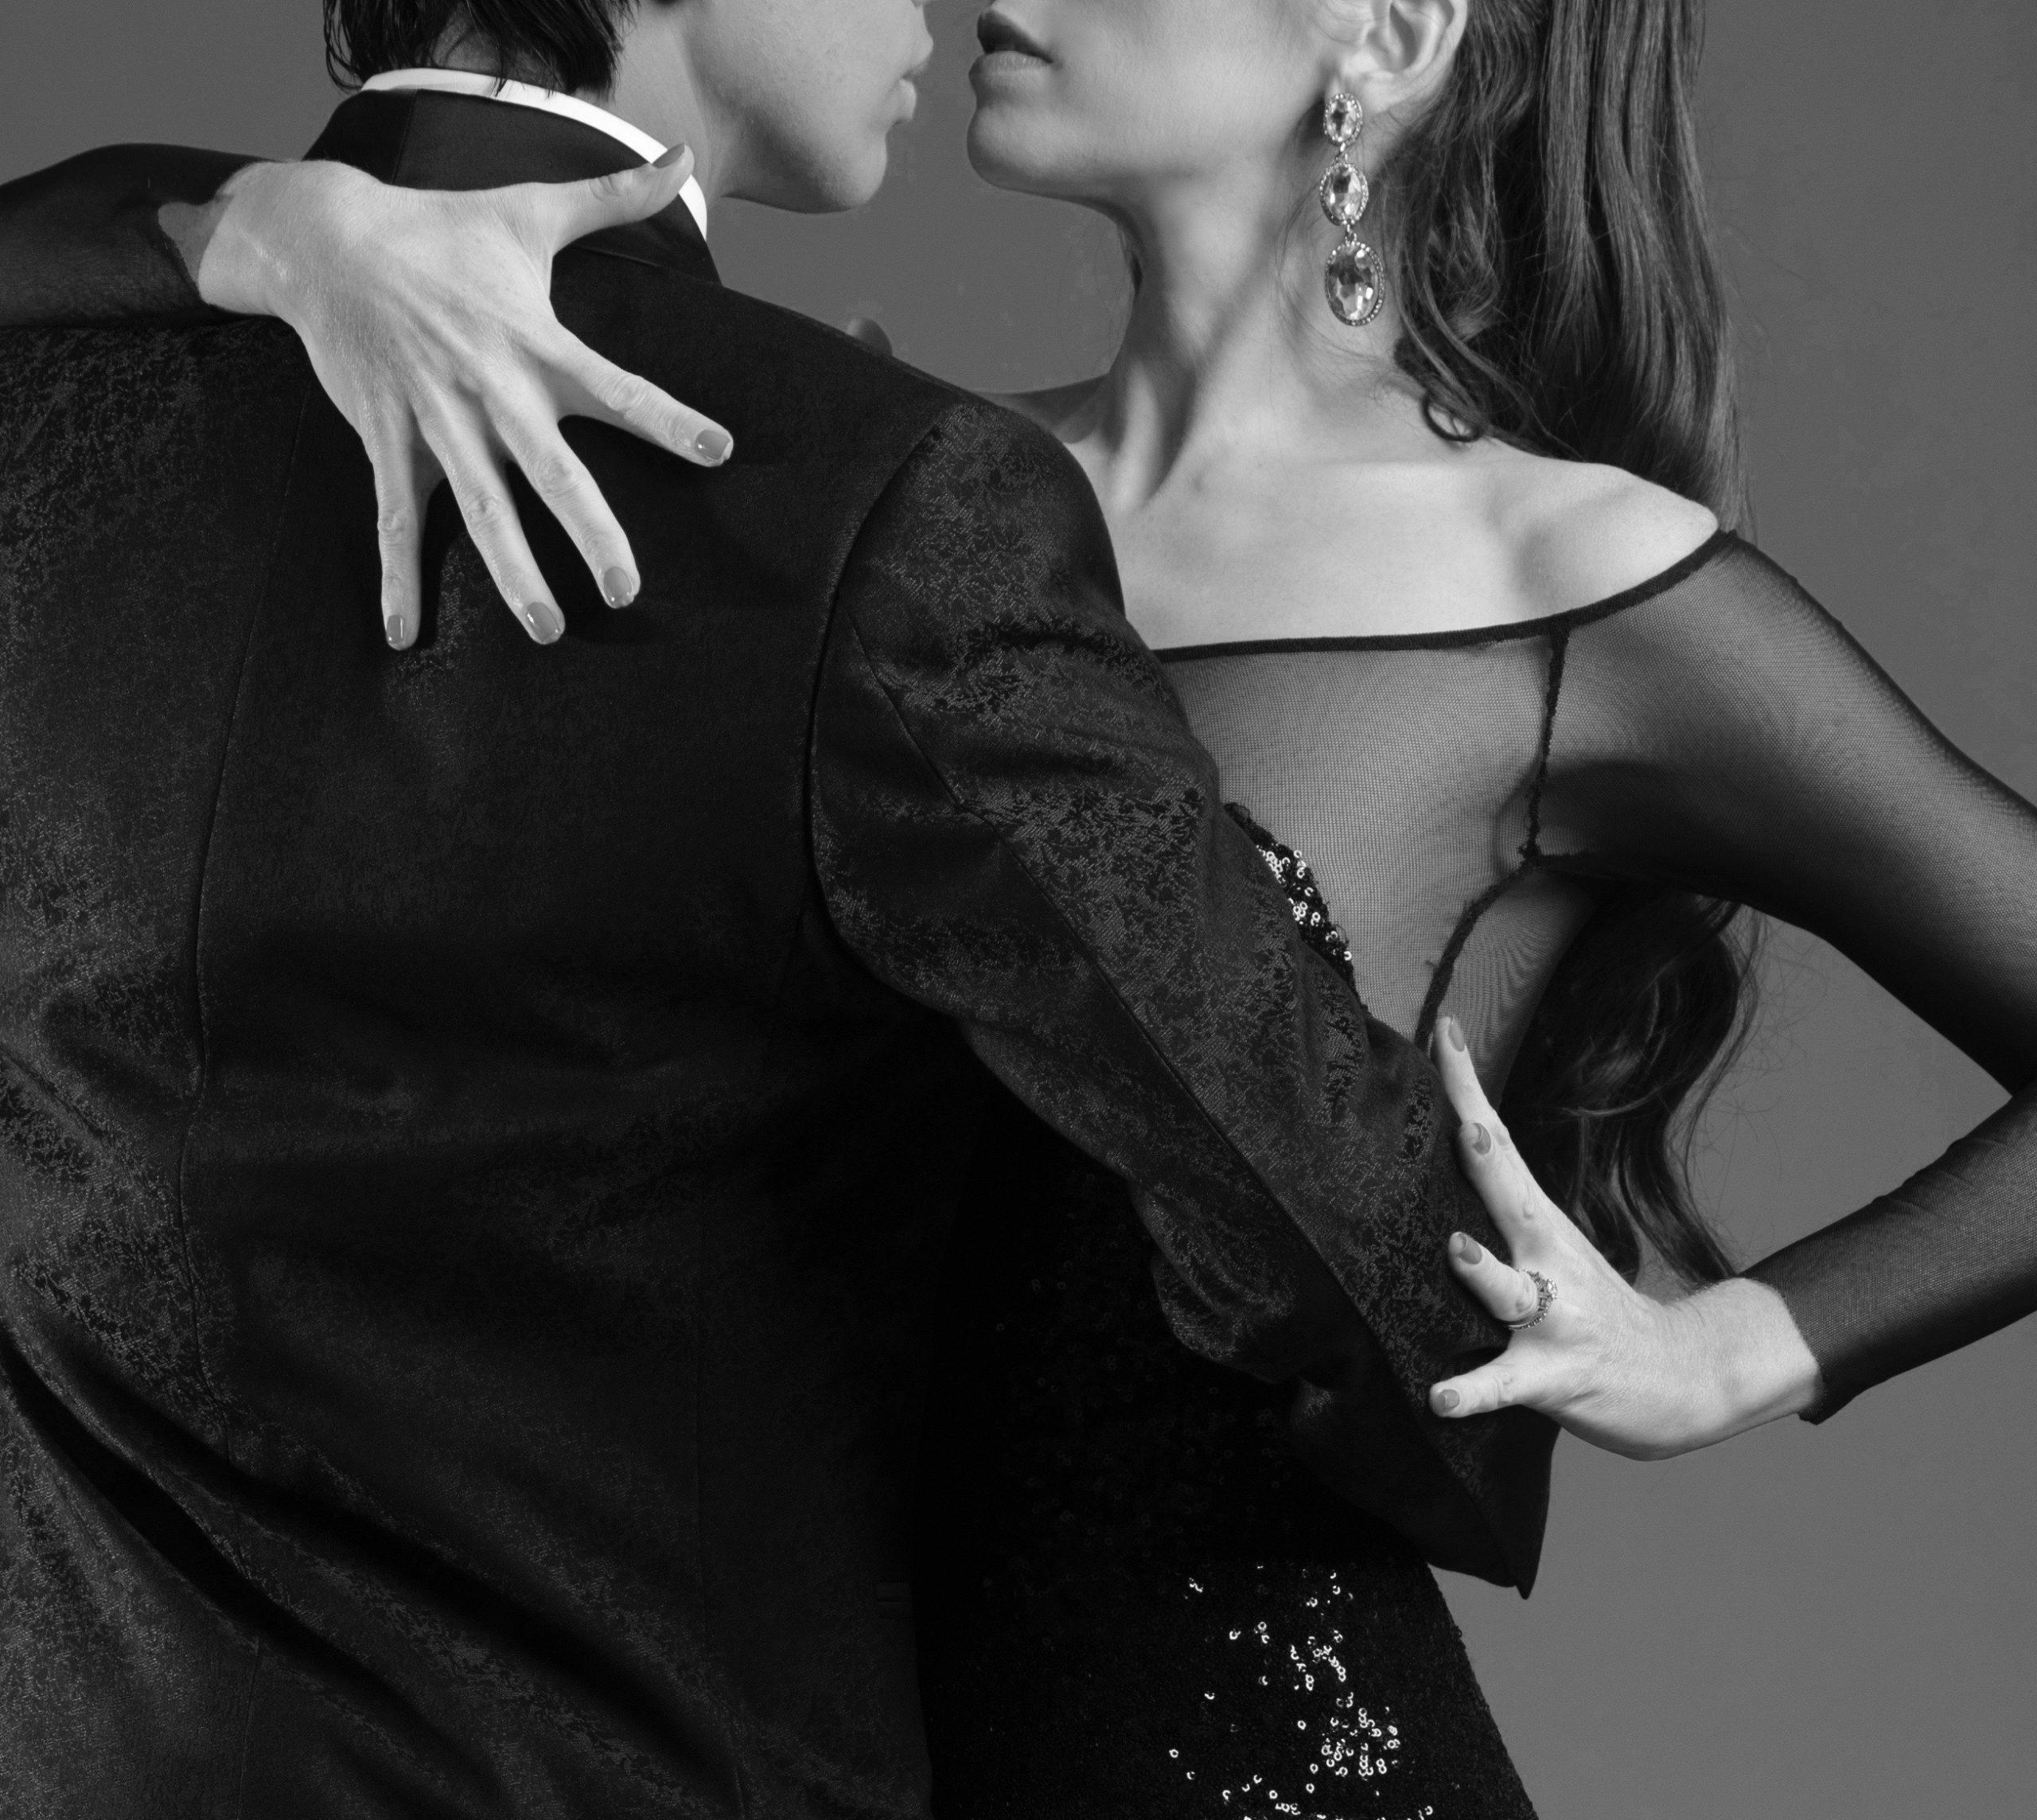 close up of a dramatic tango embrace